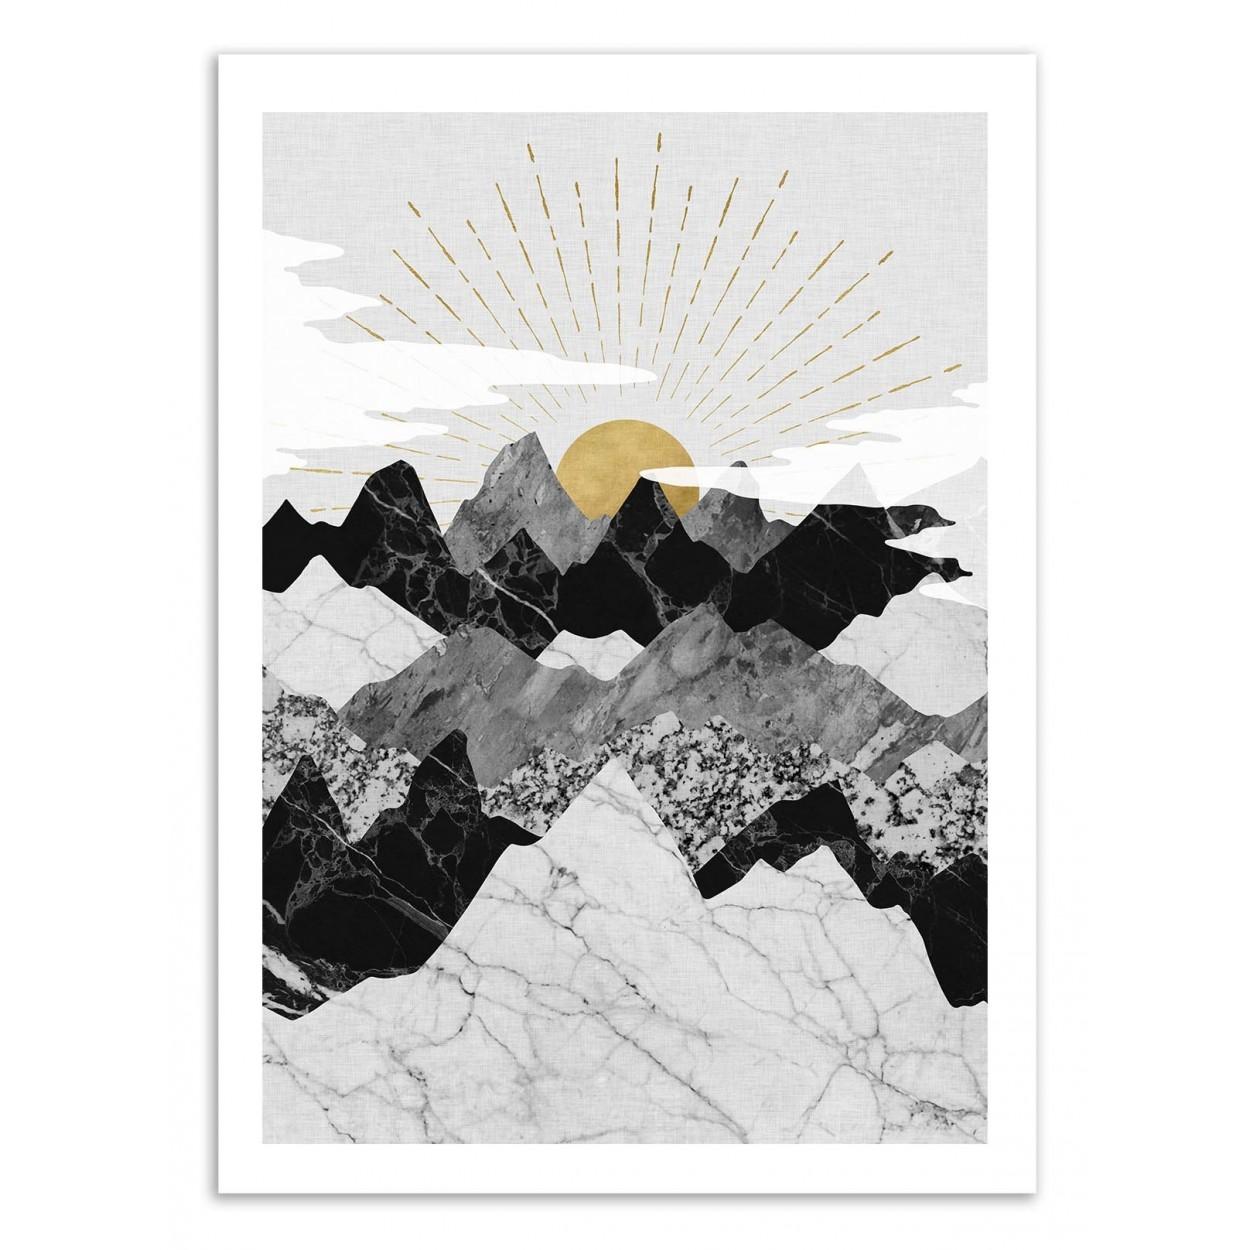 SUN RISE - Affiche d'art 50 x 70 cm